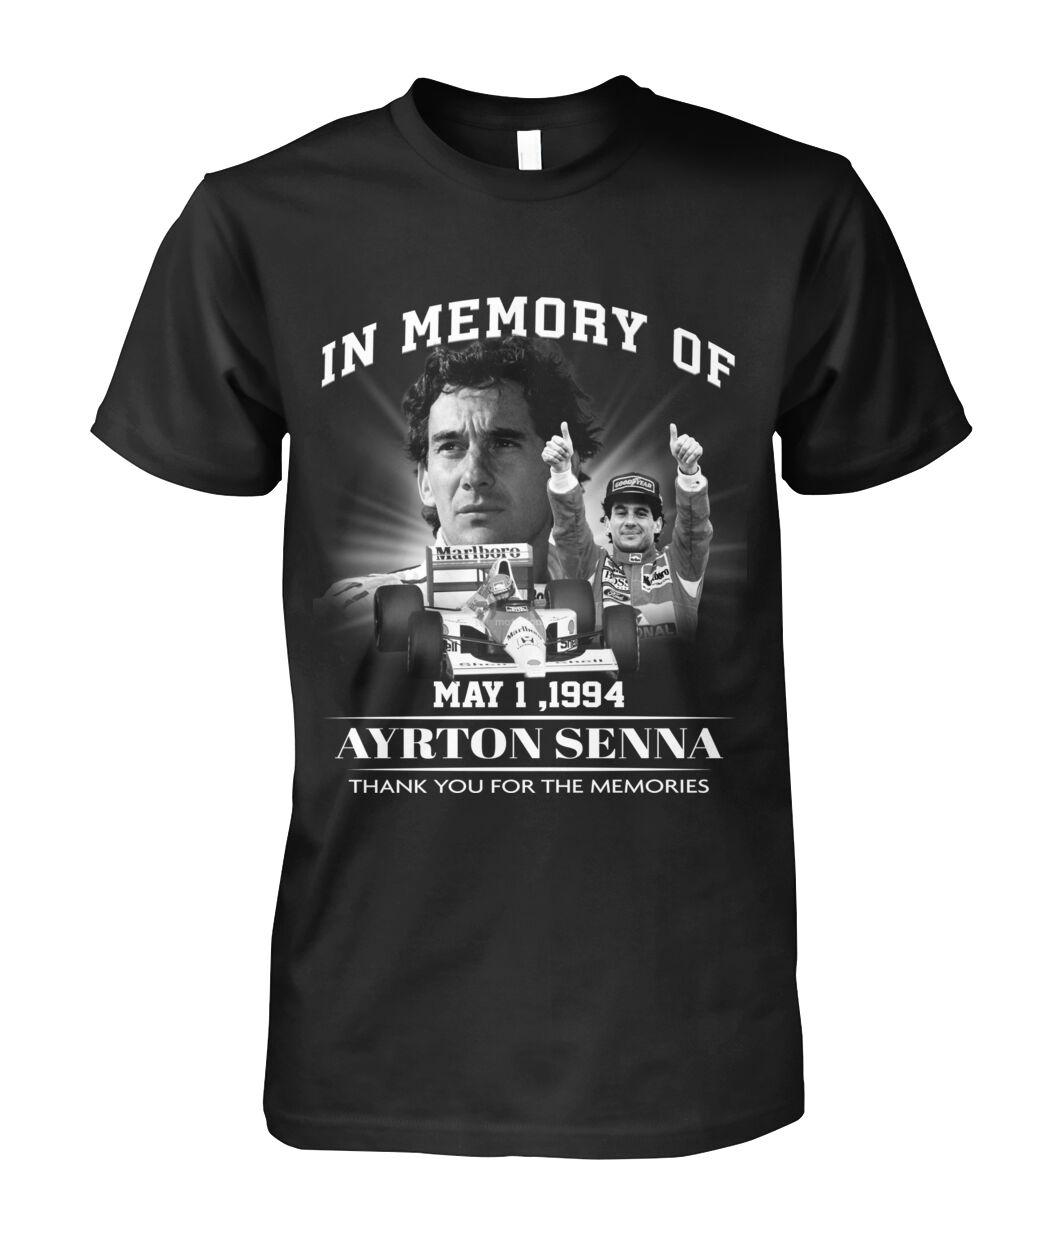 In Memory Of Ayrton Senna Shirt